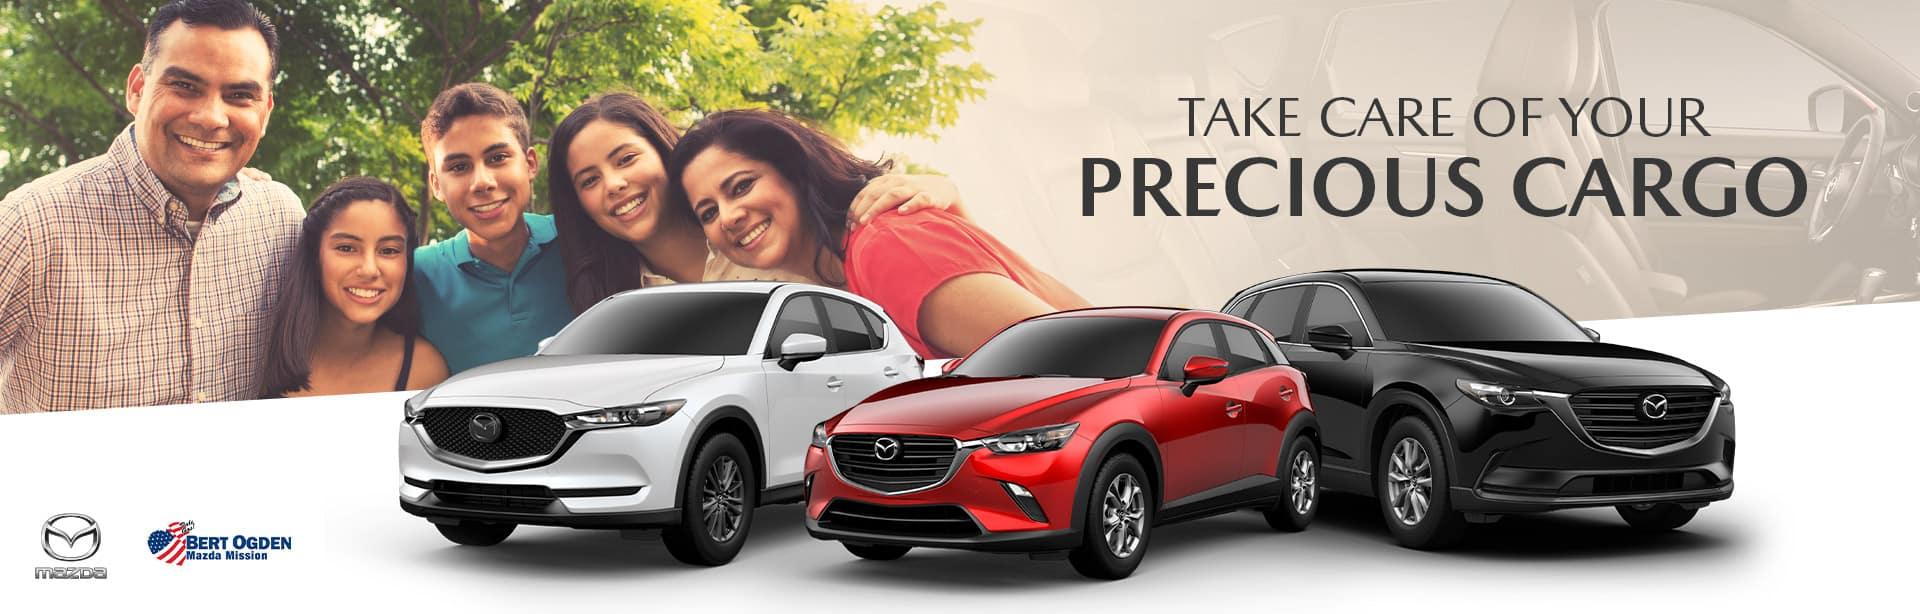 Mazda Vehicles for Large Families | Bert Ogden Mission Mazda | Mission, TX